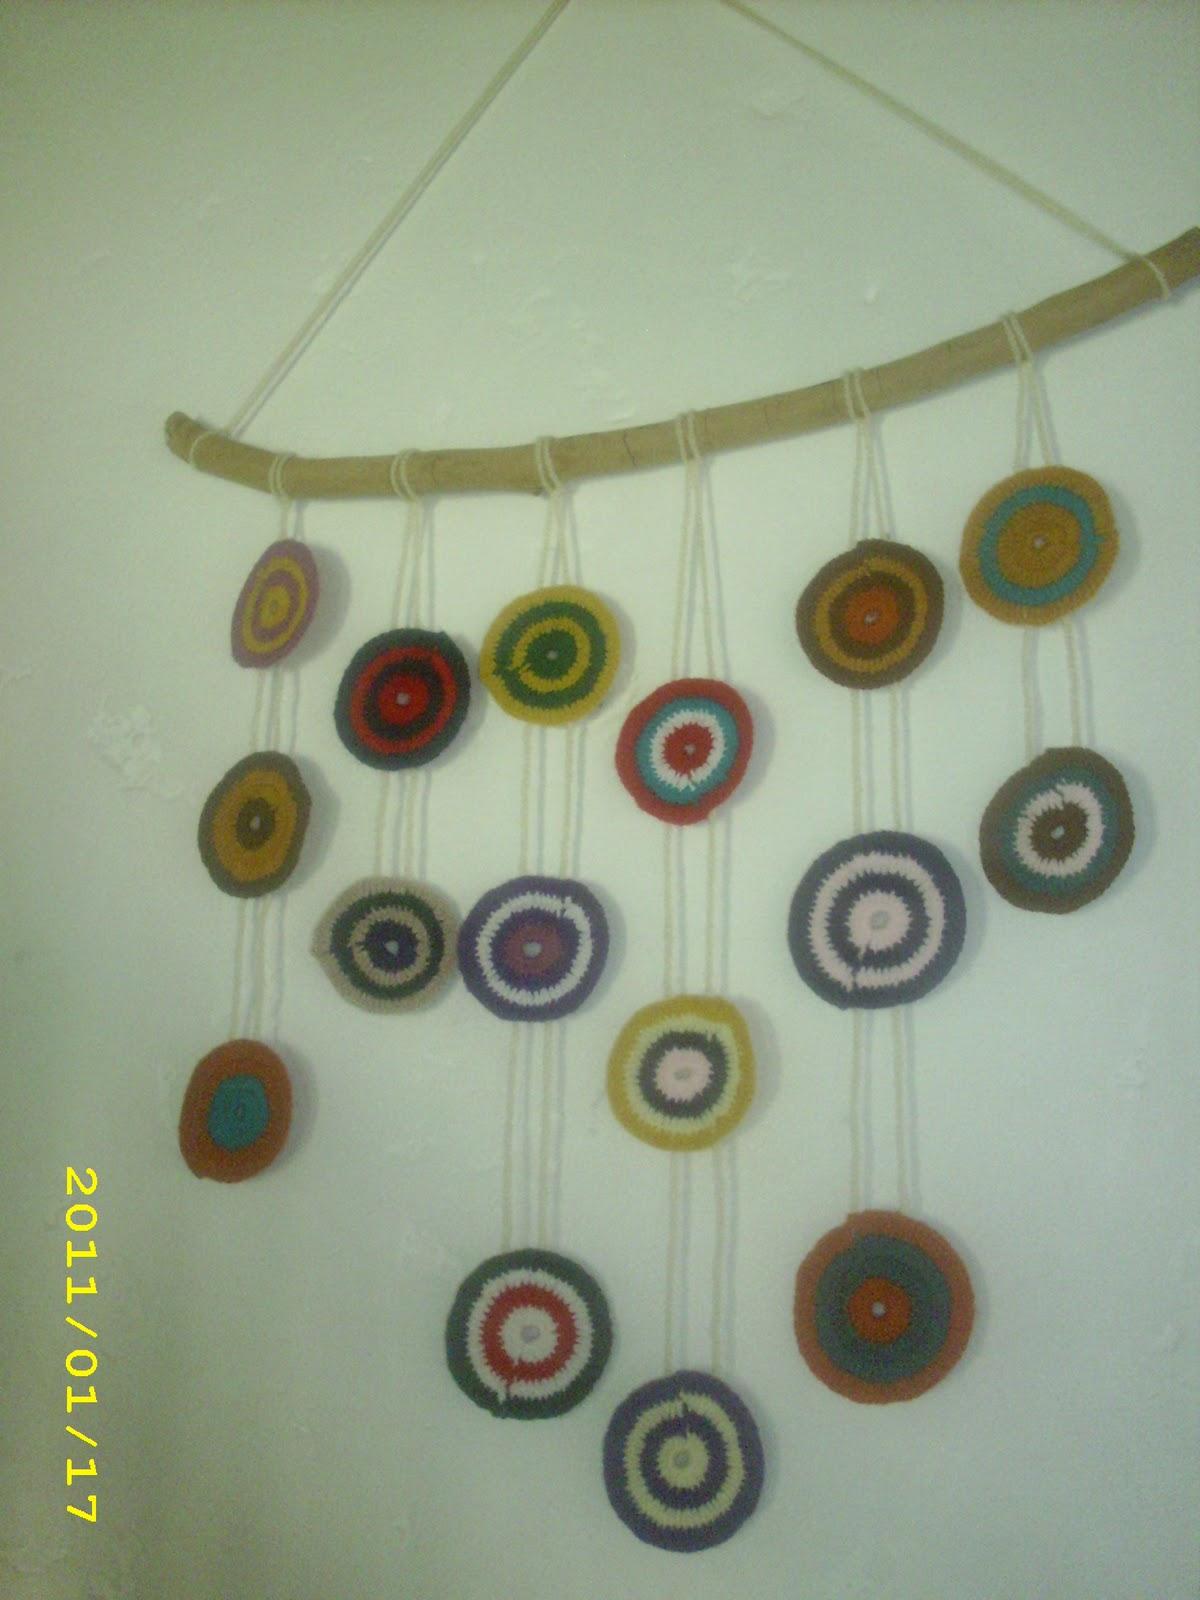 El Taller De Sofia Adorno Para Pared En Crochet - Adornos-para-paredes